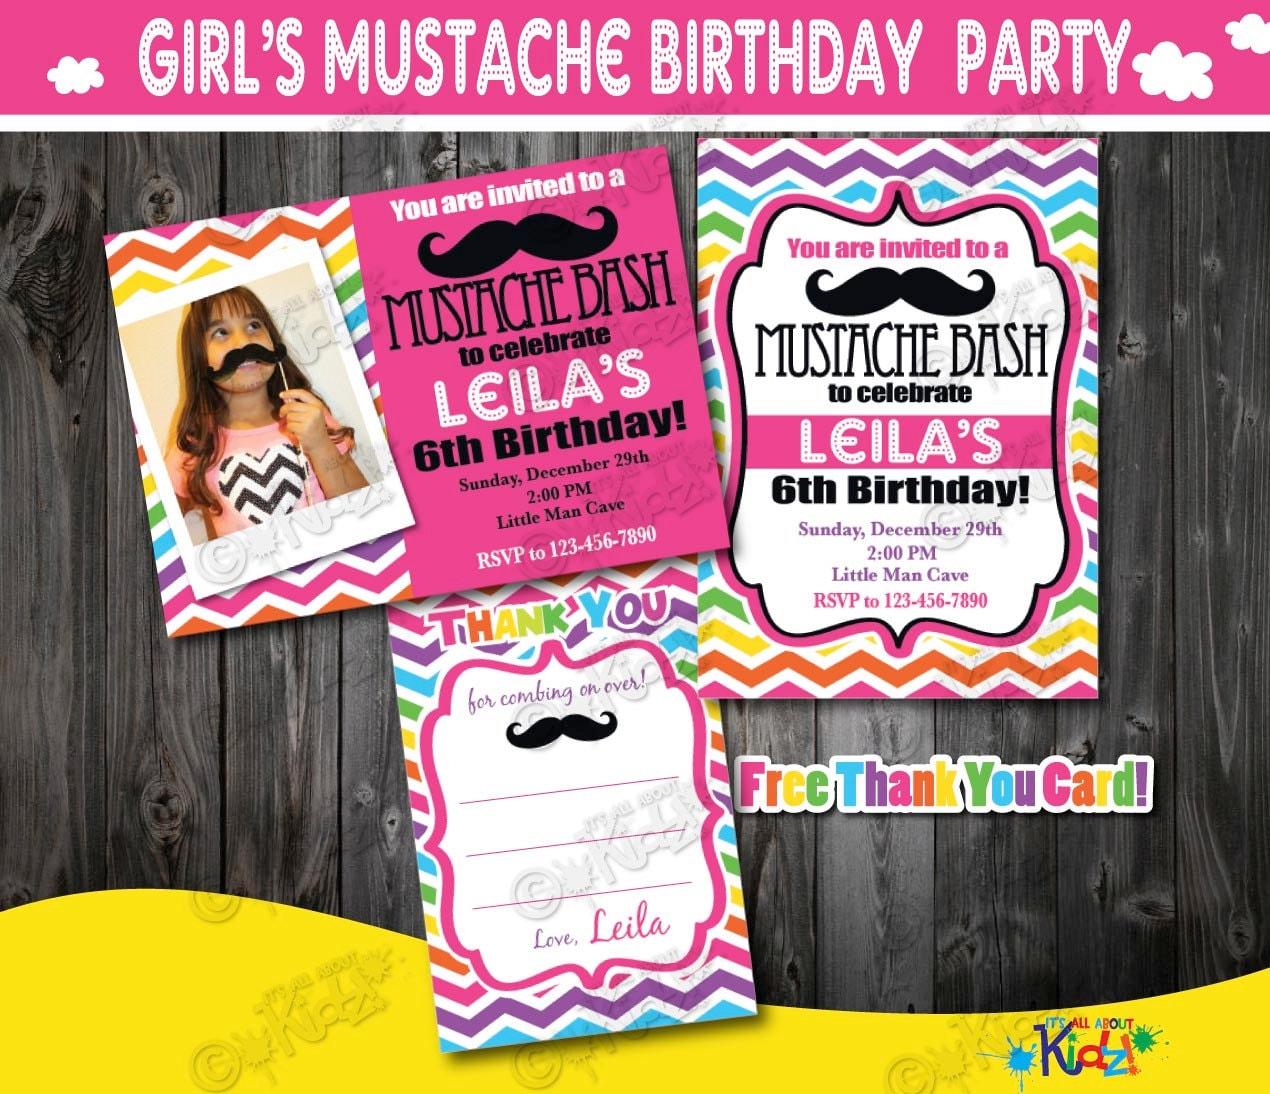 Girl Mustache Party invitationMustache Birthday